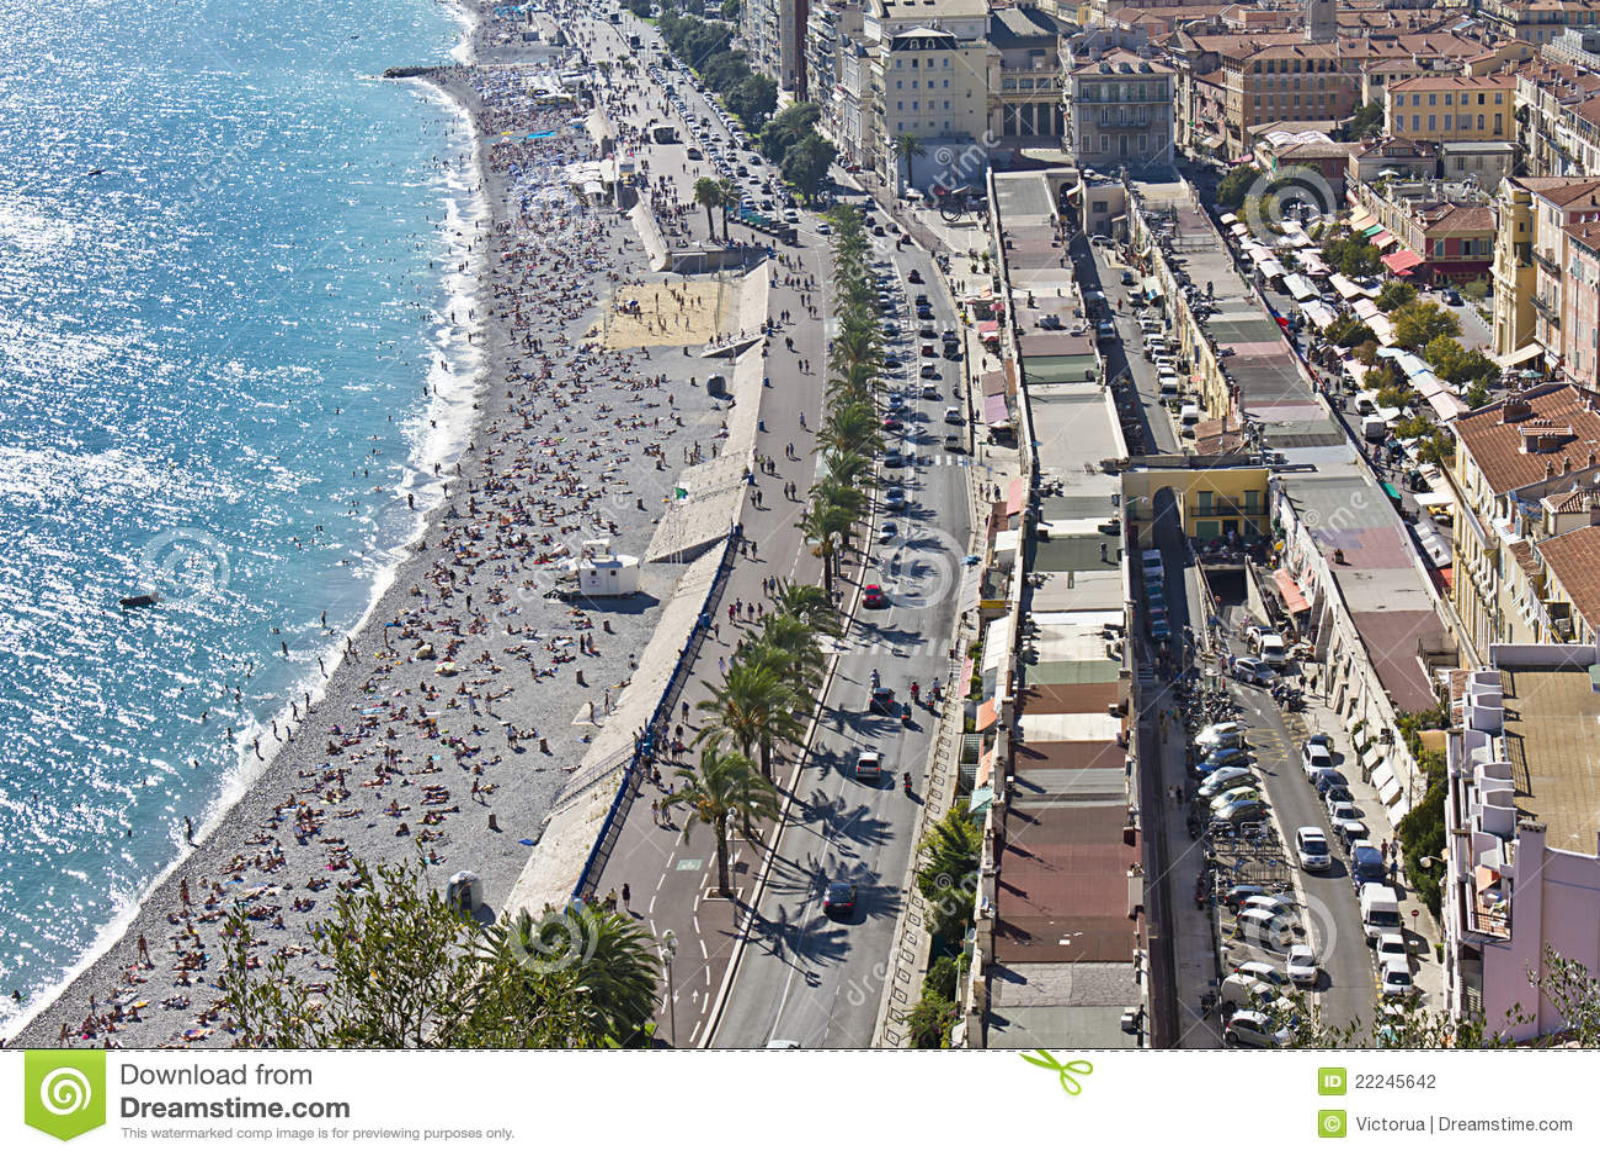 Promenade Des Angles Nice France